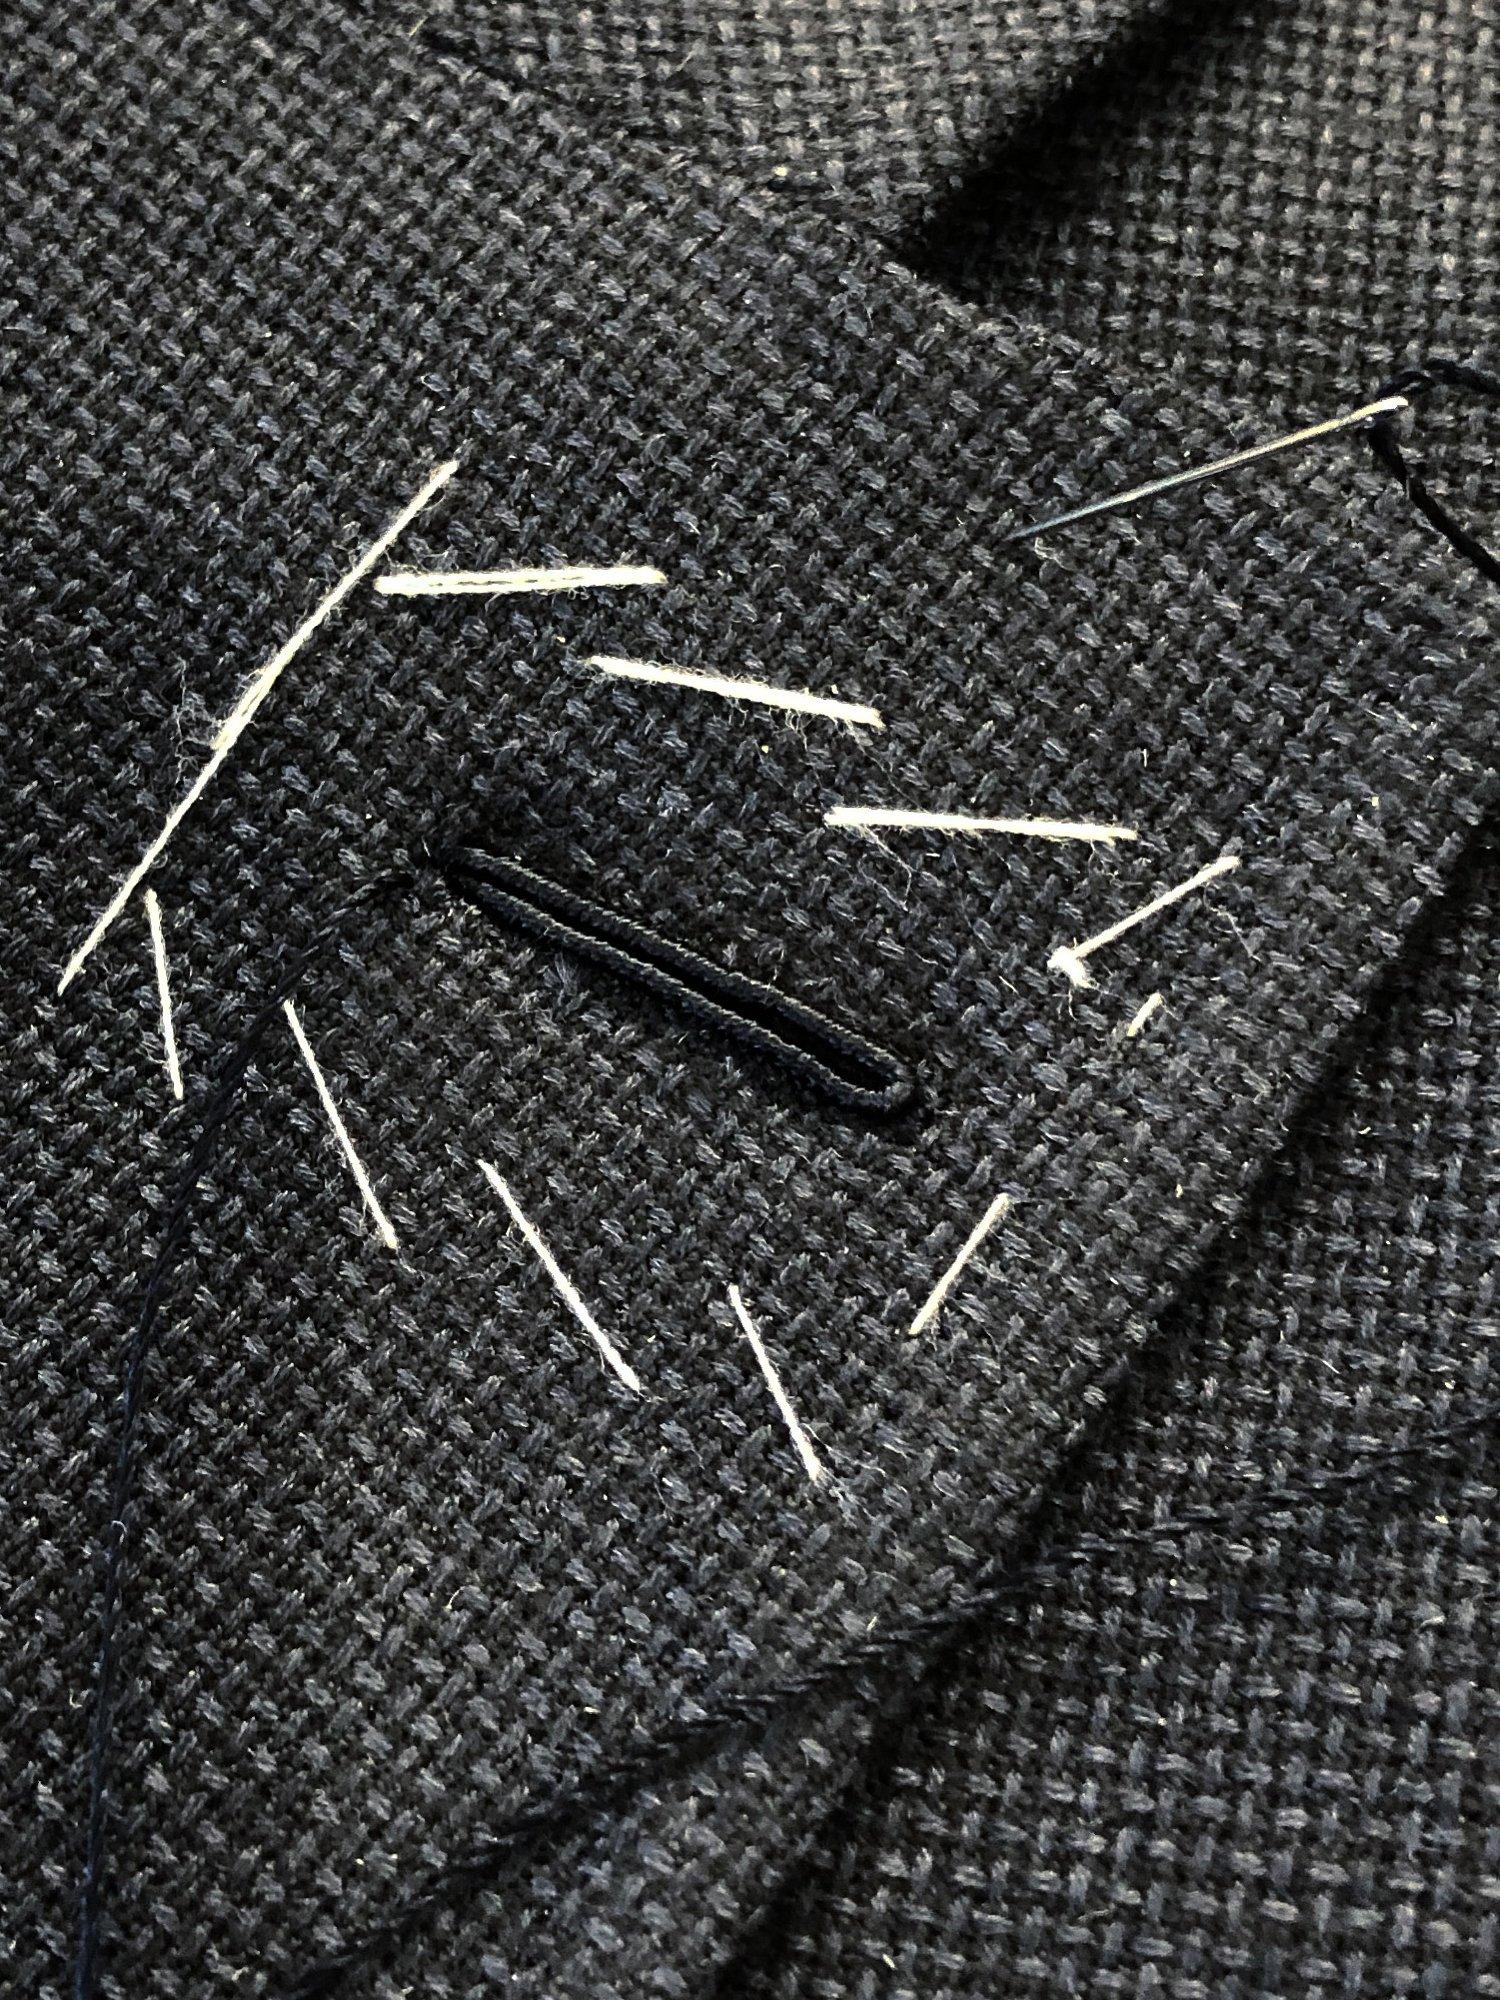 Sartoria Sciarra, cerruti wool and cashmere hopsack fabric, navy bespoke jacket, bespoke tailor, Sydney tailoring, Italian bespoke tailoring, Milanese lapel hole, hand made button hole, artisan craftsmanship, luxury bespoke tailoring, luxury tailor, Italian elegance